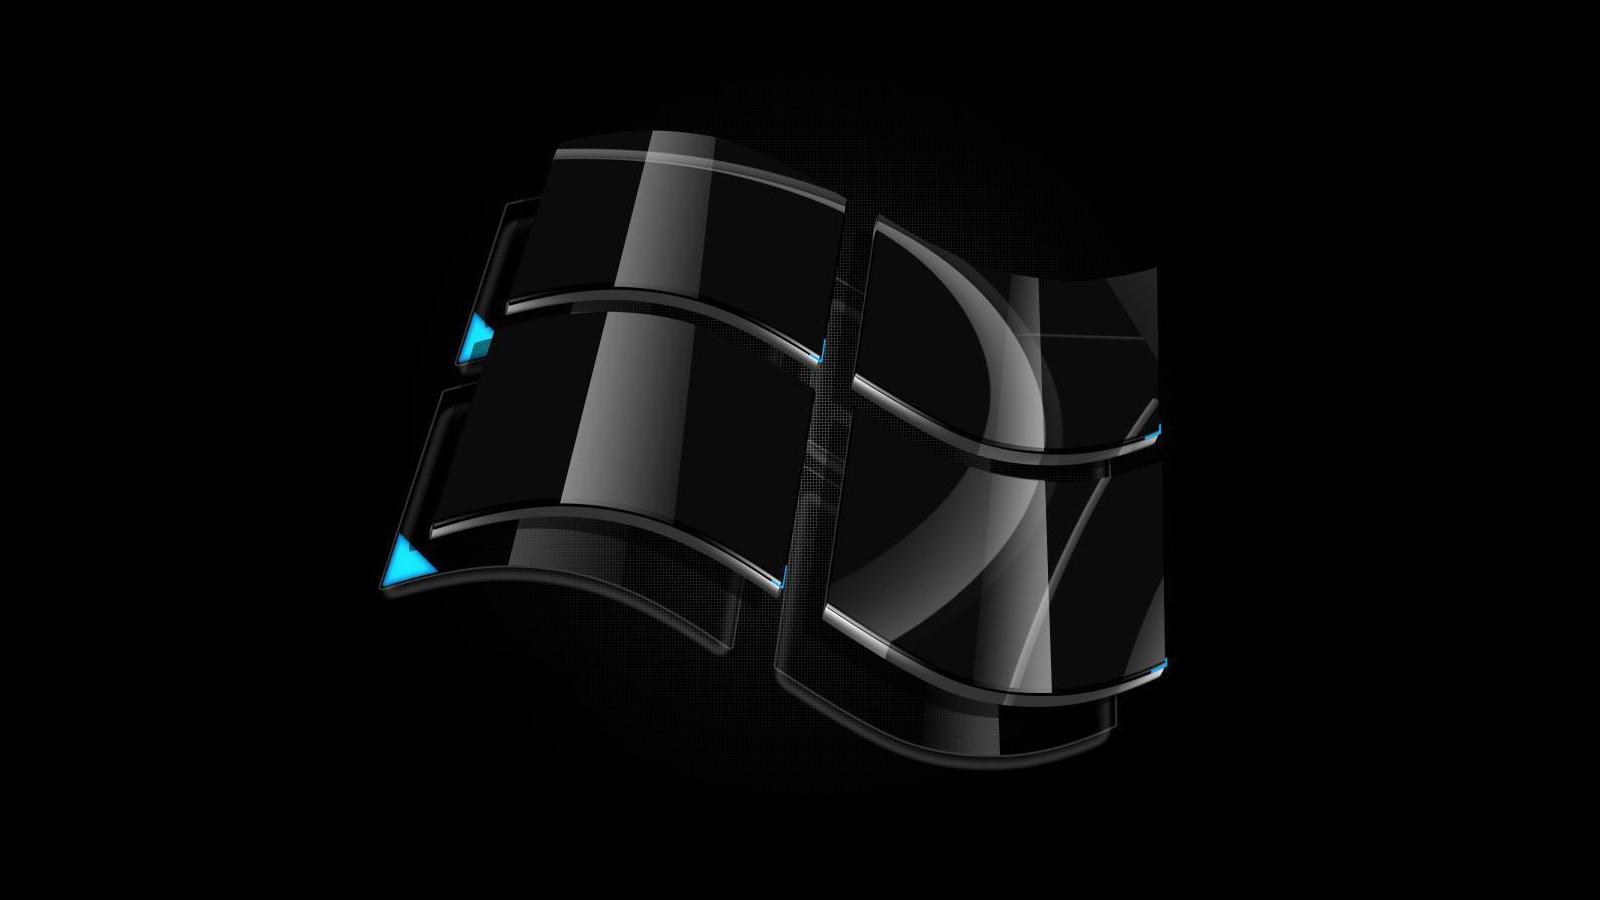 1600x900 Windows 10 Wallpaper - WallpaperSafari